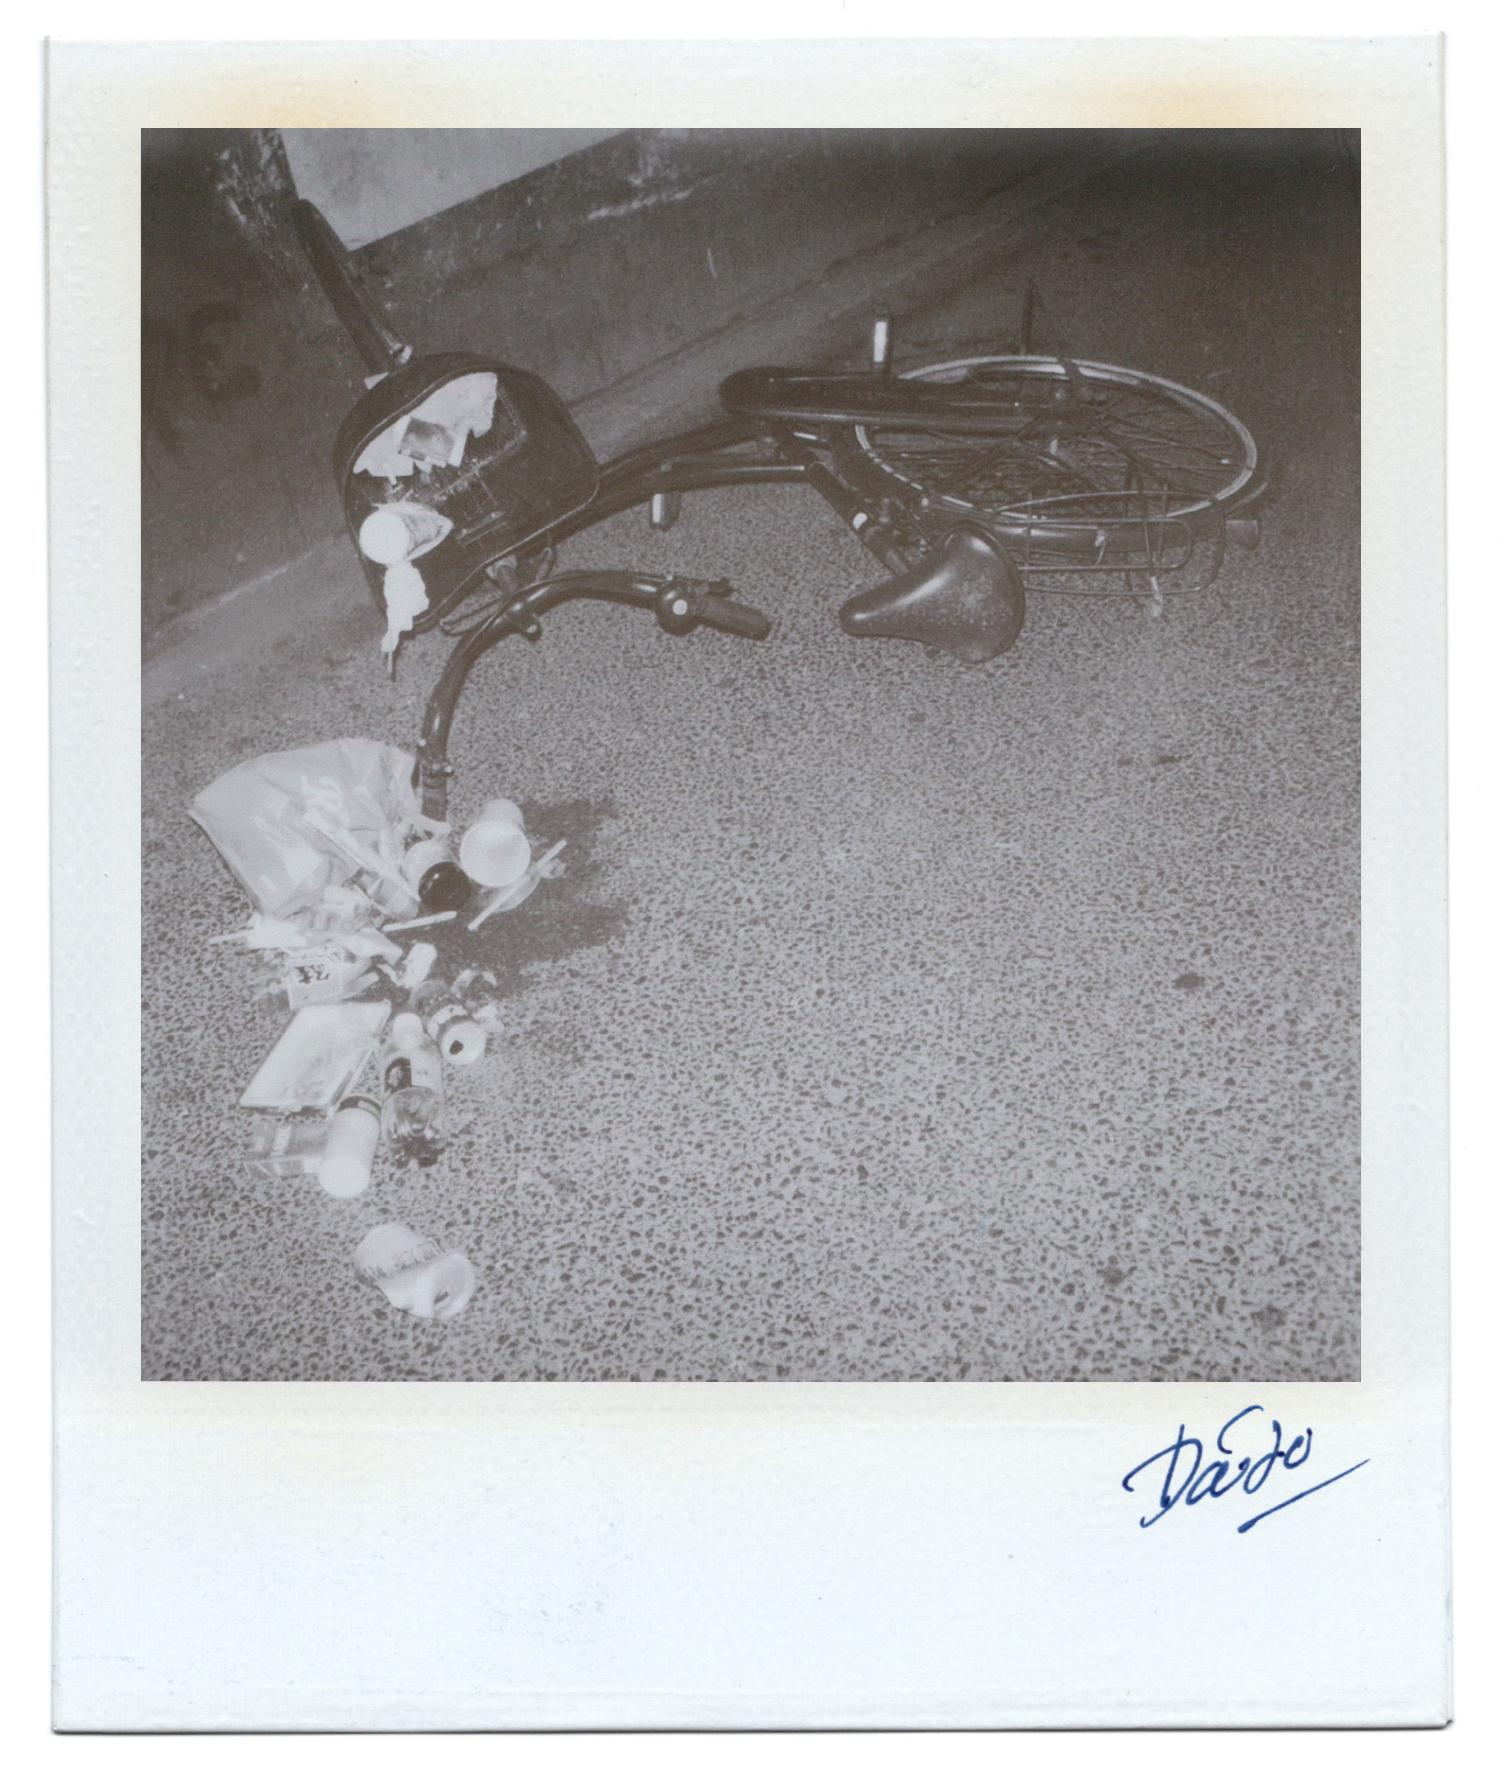 Moriyama Daido, Passage, 1998, Polaroid, 11 x 9 cm2